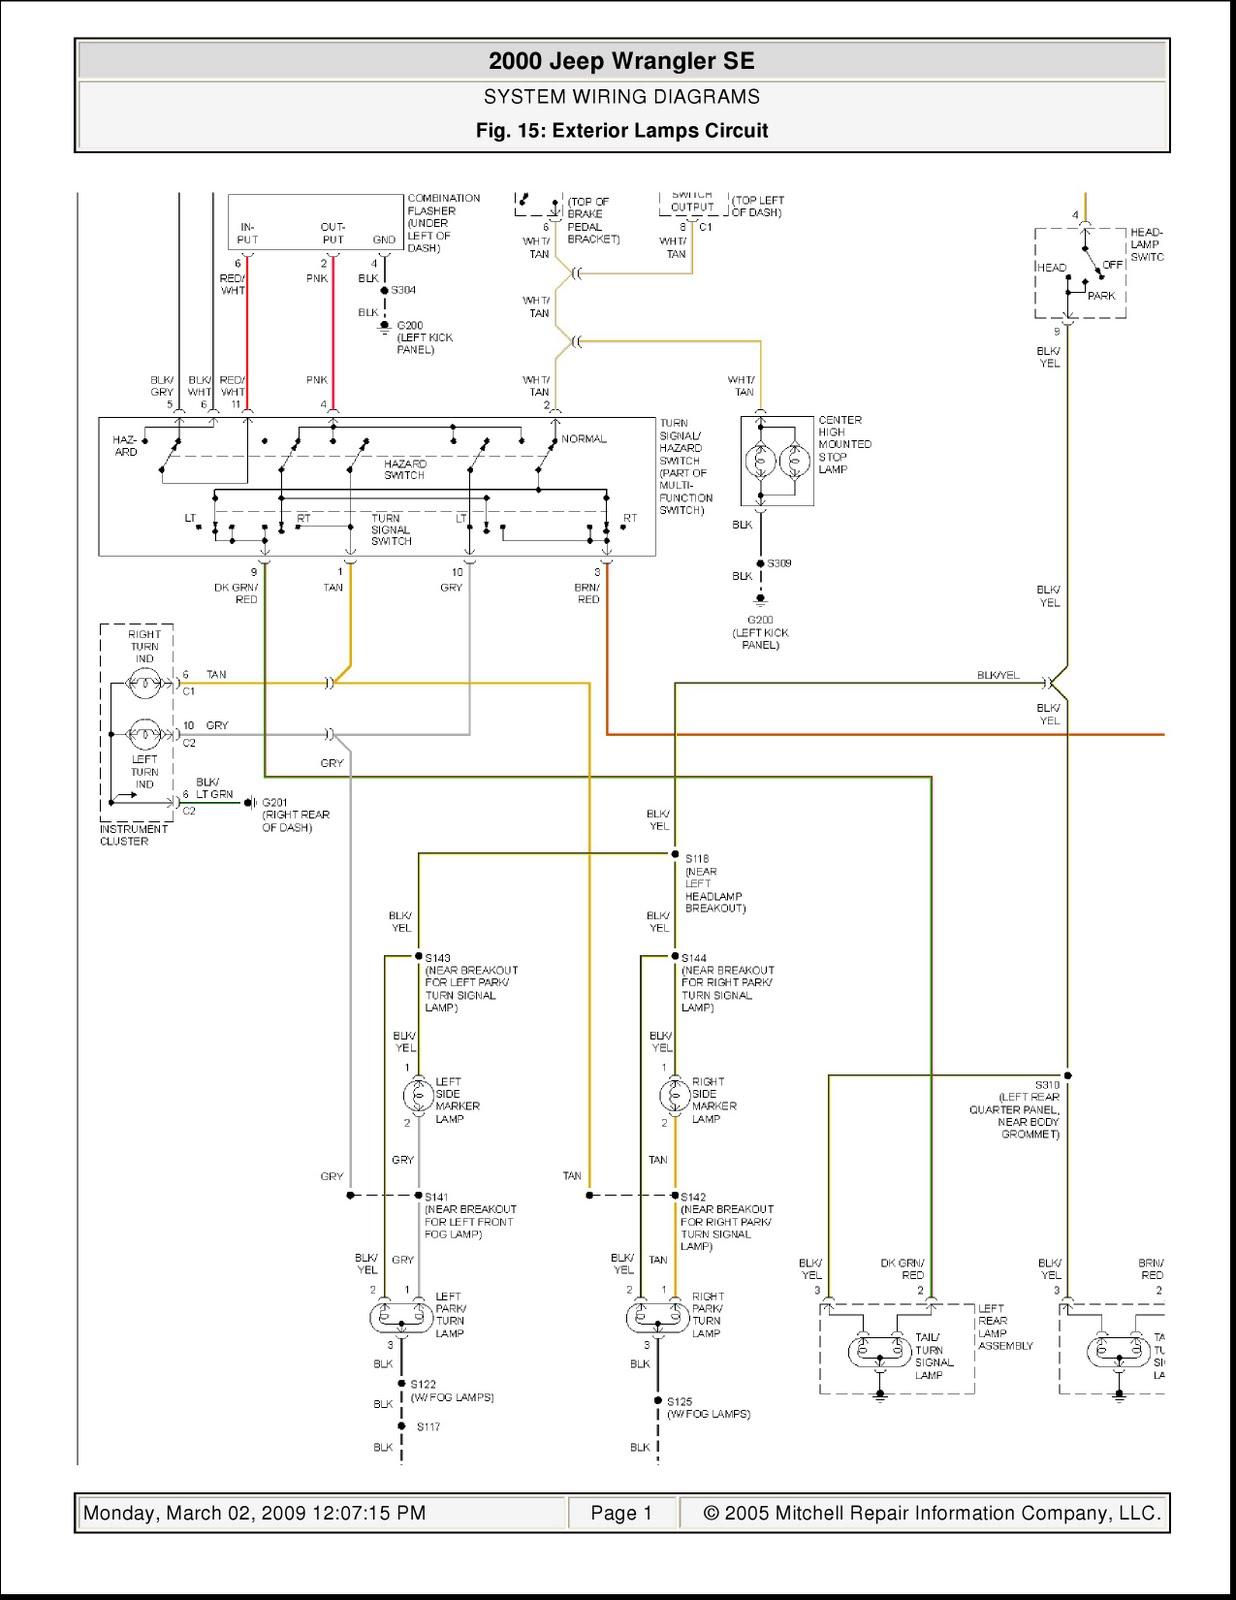 jeep wrangler tj wiring diagram - dolgular, Wiring diagram